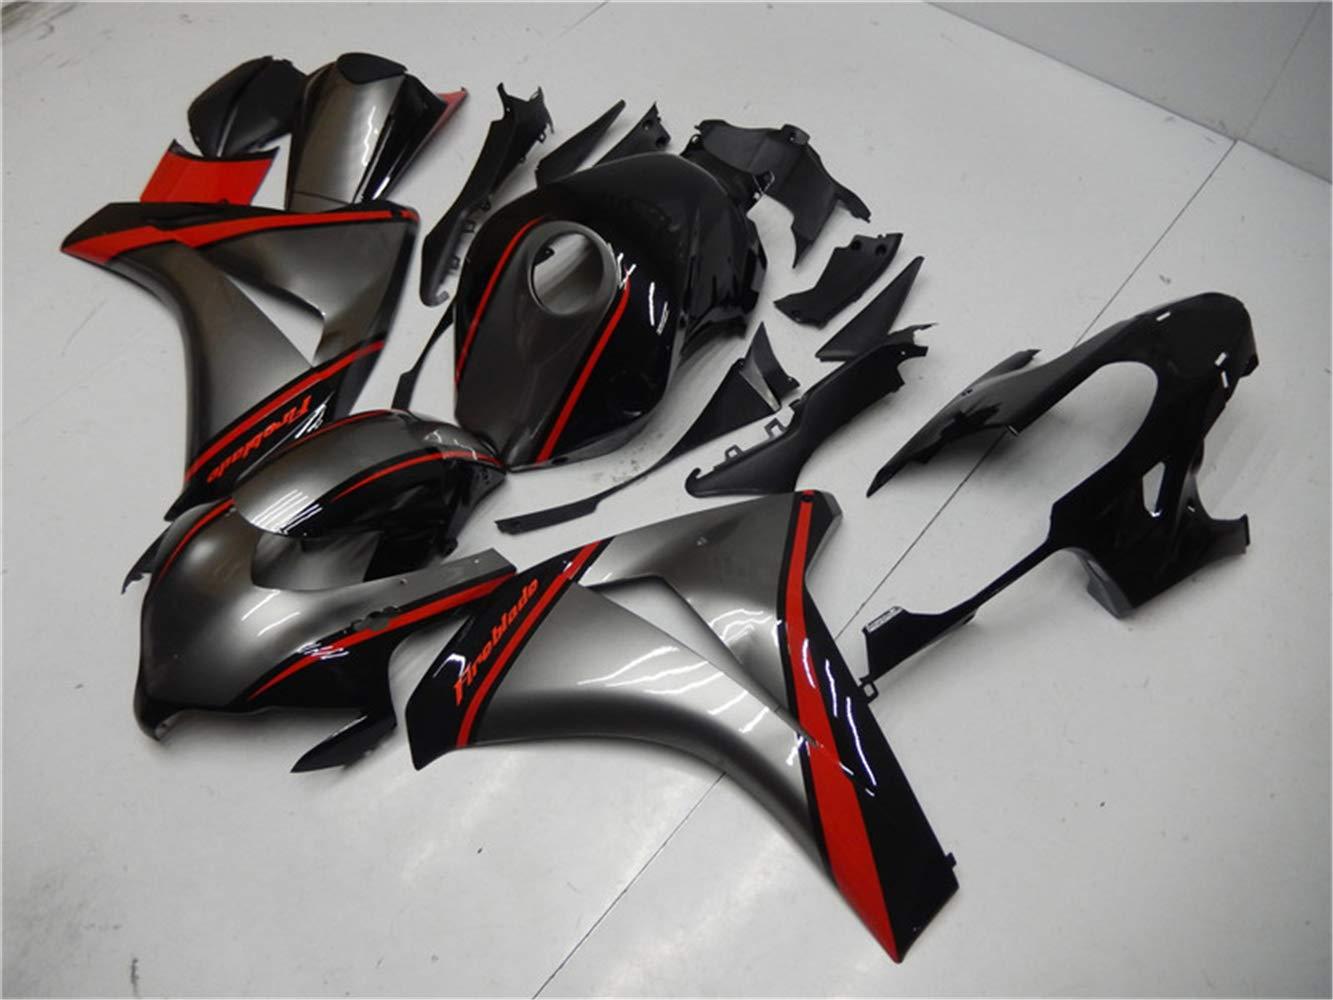 New Glossy Black Fairing Fit for HONDA 2008 2009 2010 2011 CBR1000RR CBR 1000RR Injection Mold ABS Plastics Aftermarket Bodywork Bodyframe Kit Set 08 09 10 11